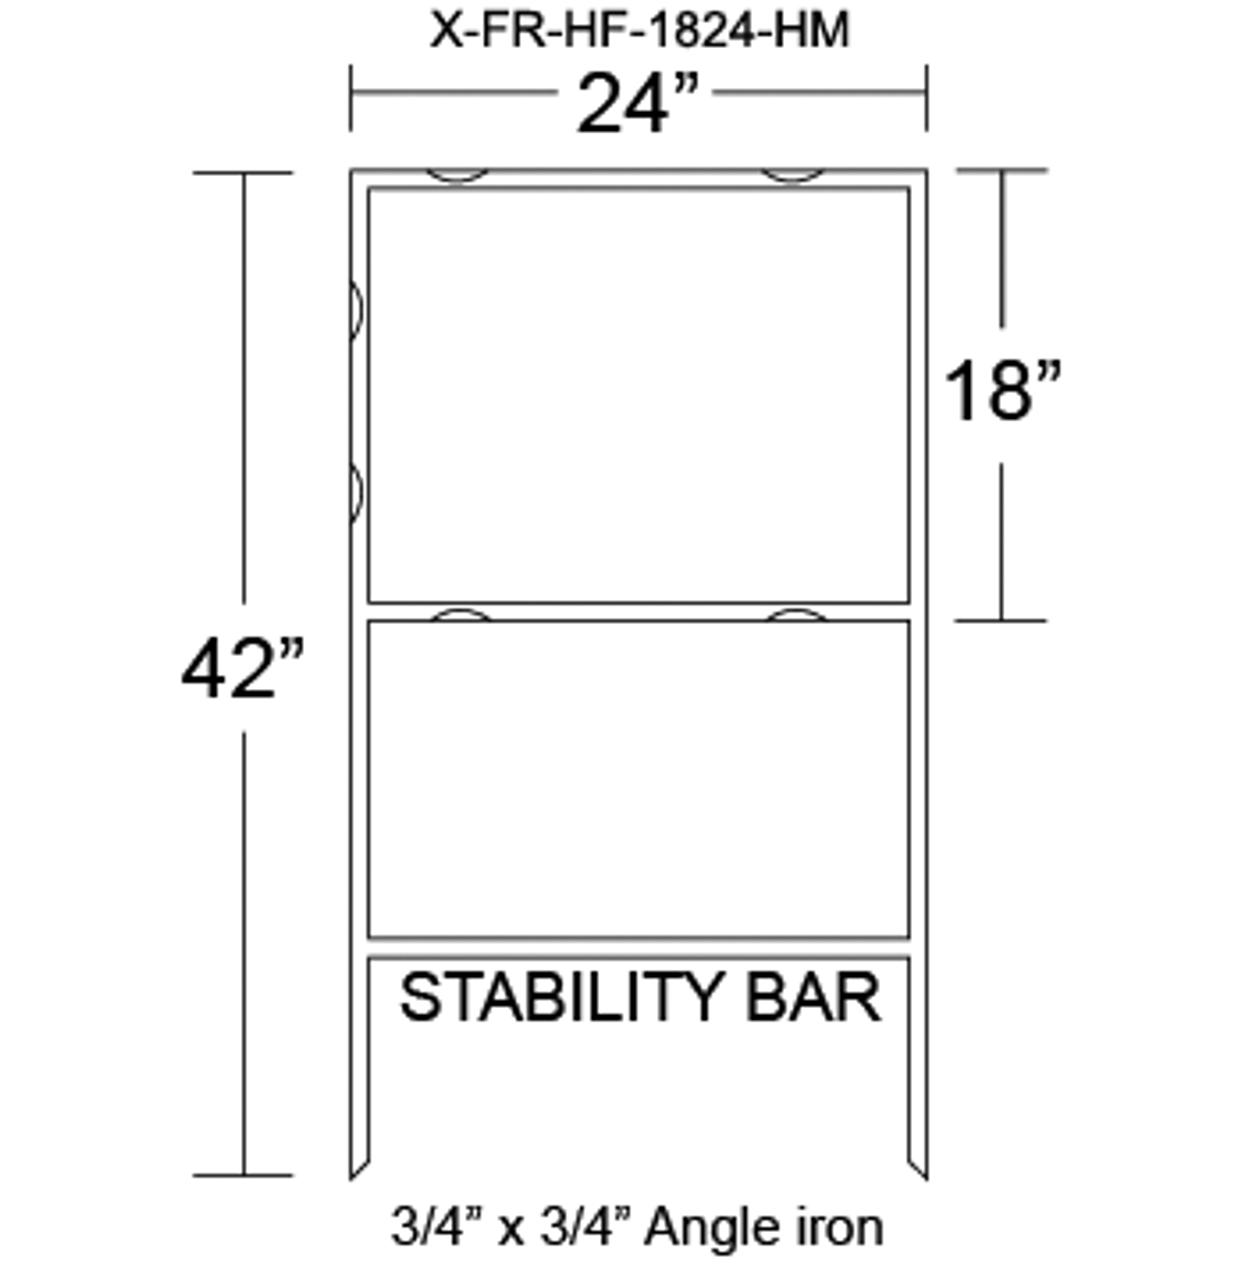 X-FR-HF-1824-HM